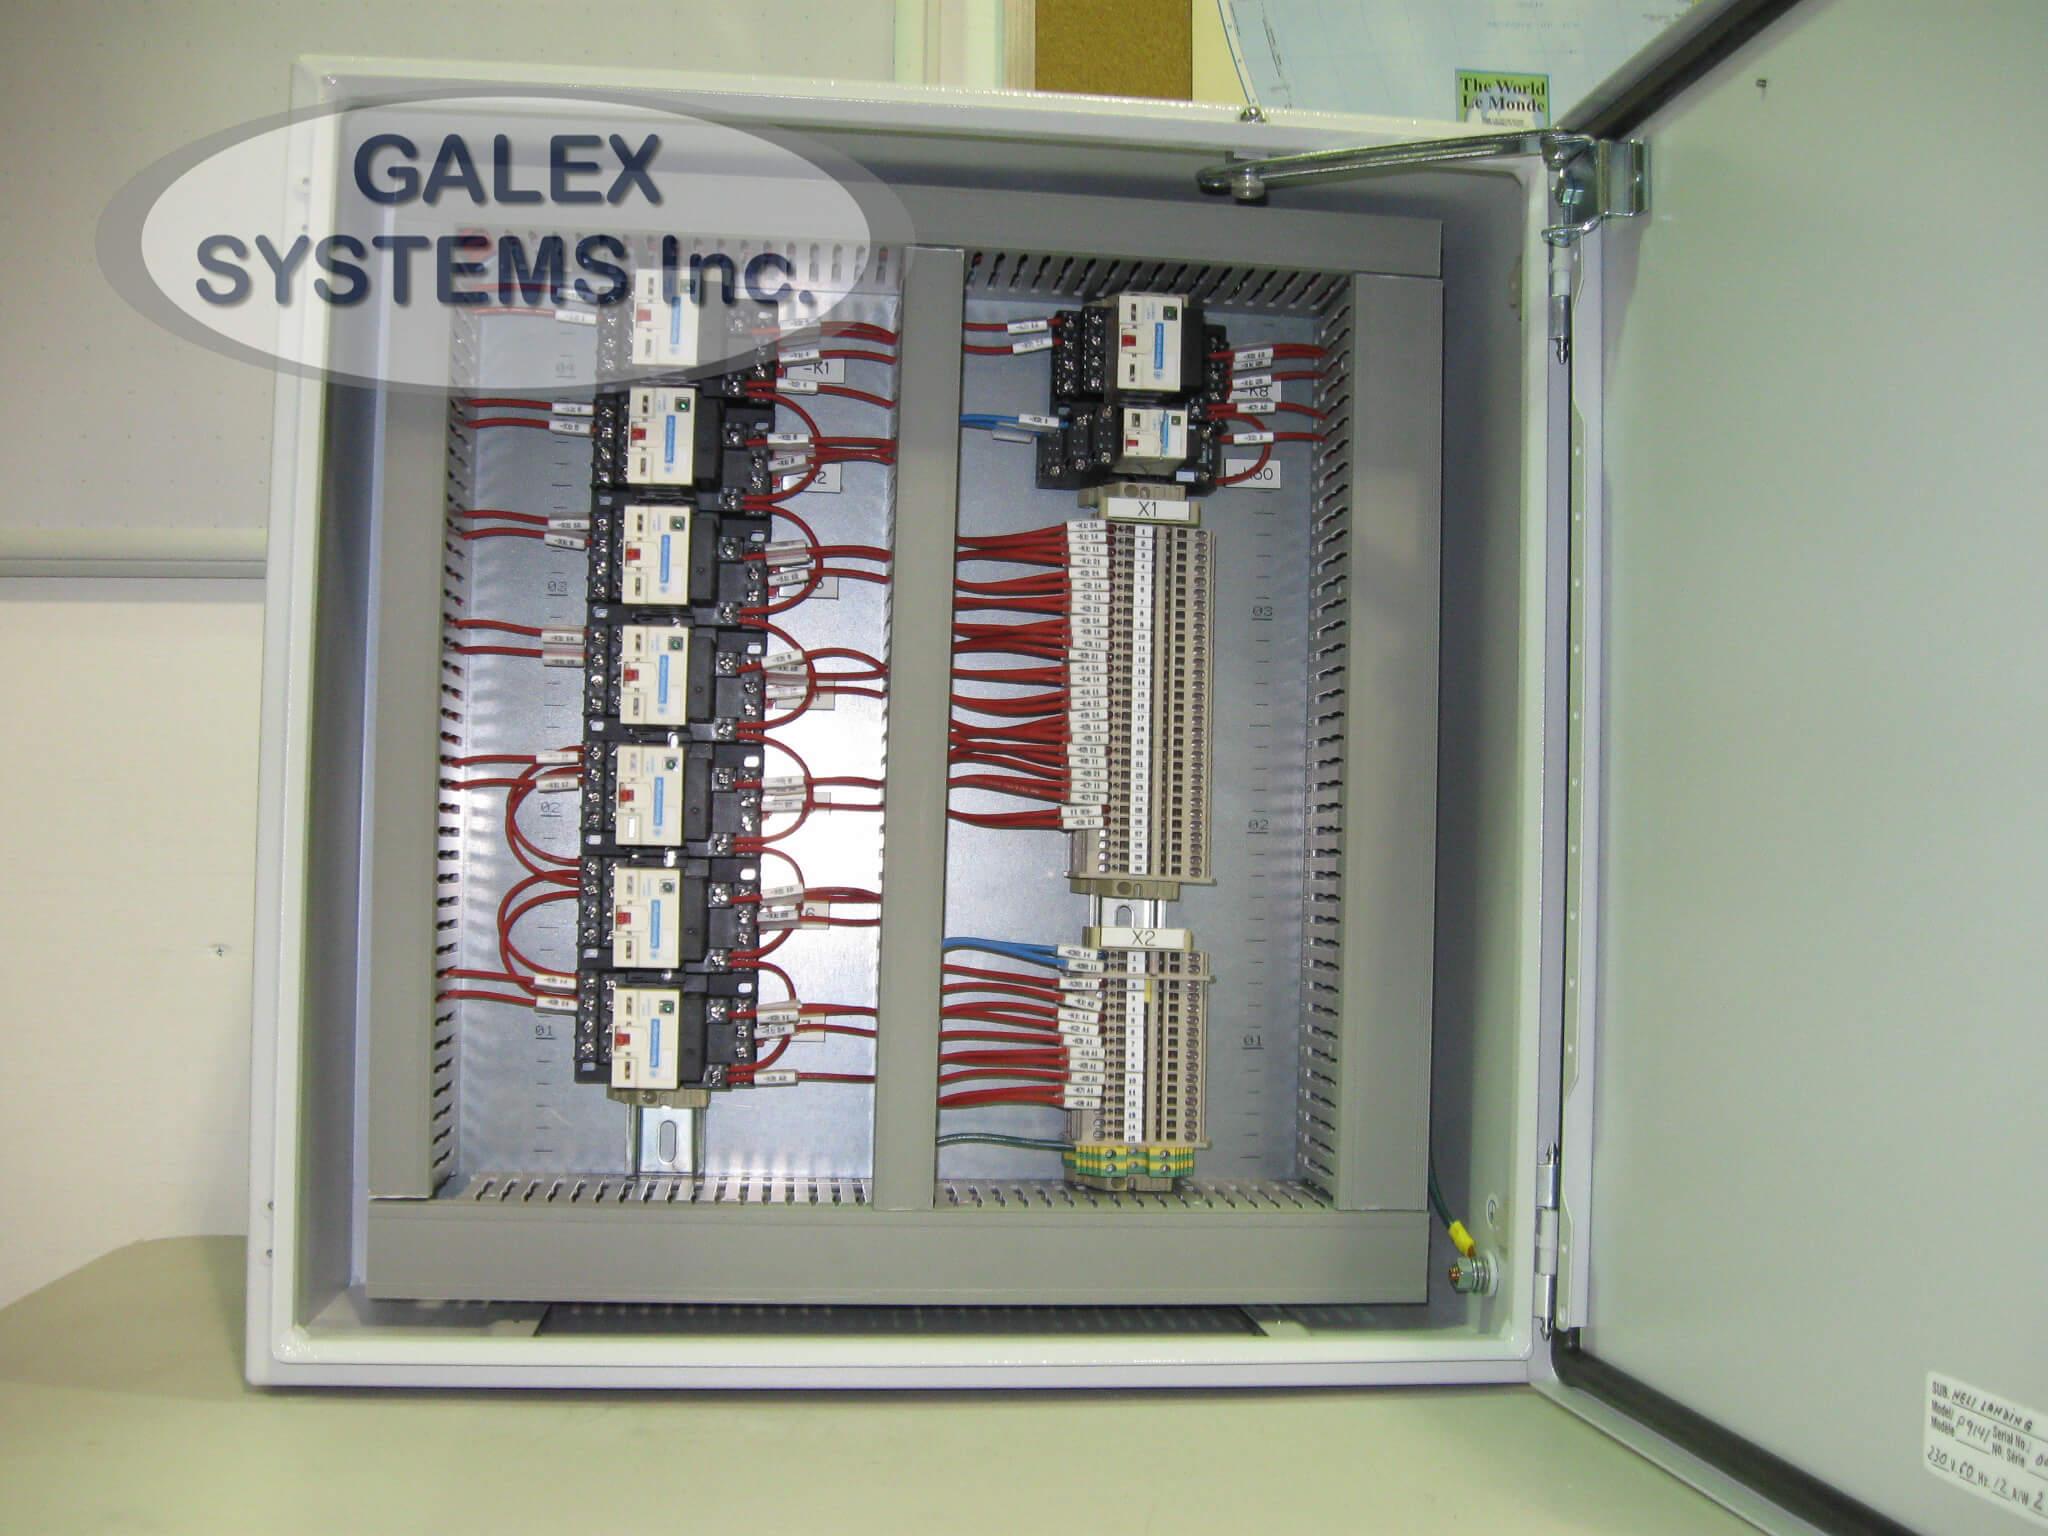 49 - Helideck Lighting Control Box - Galex Systems Inc.